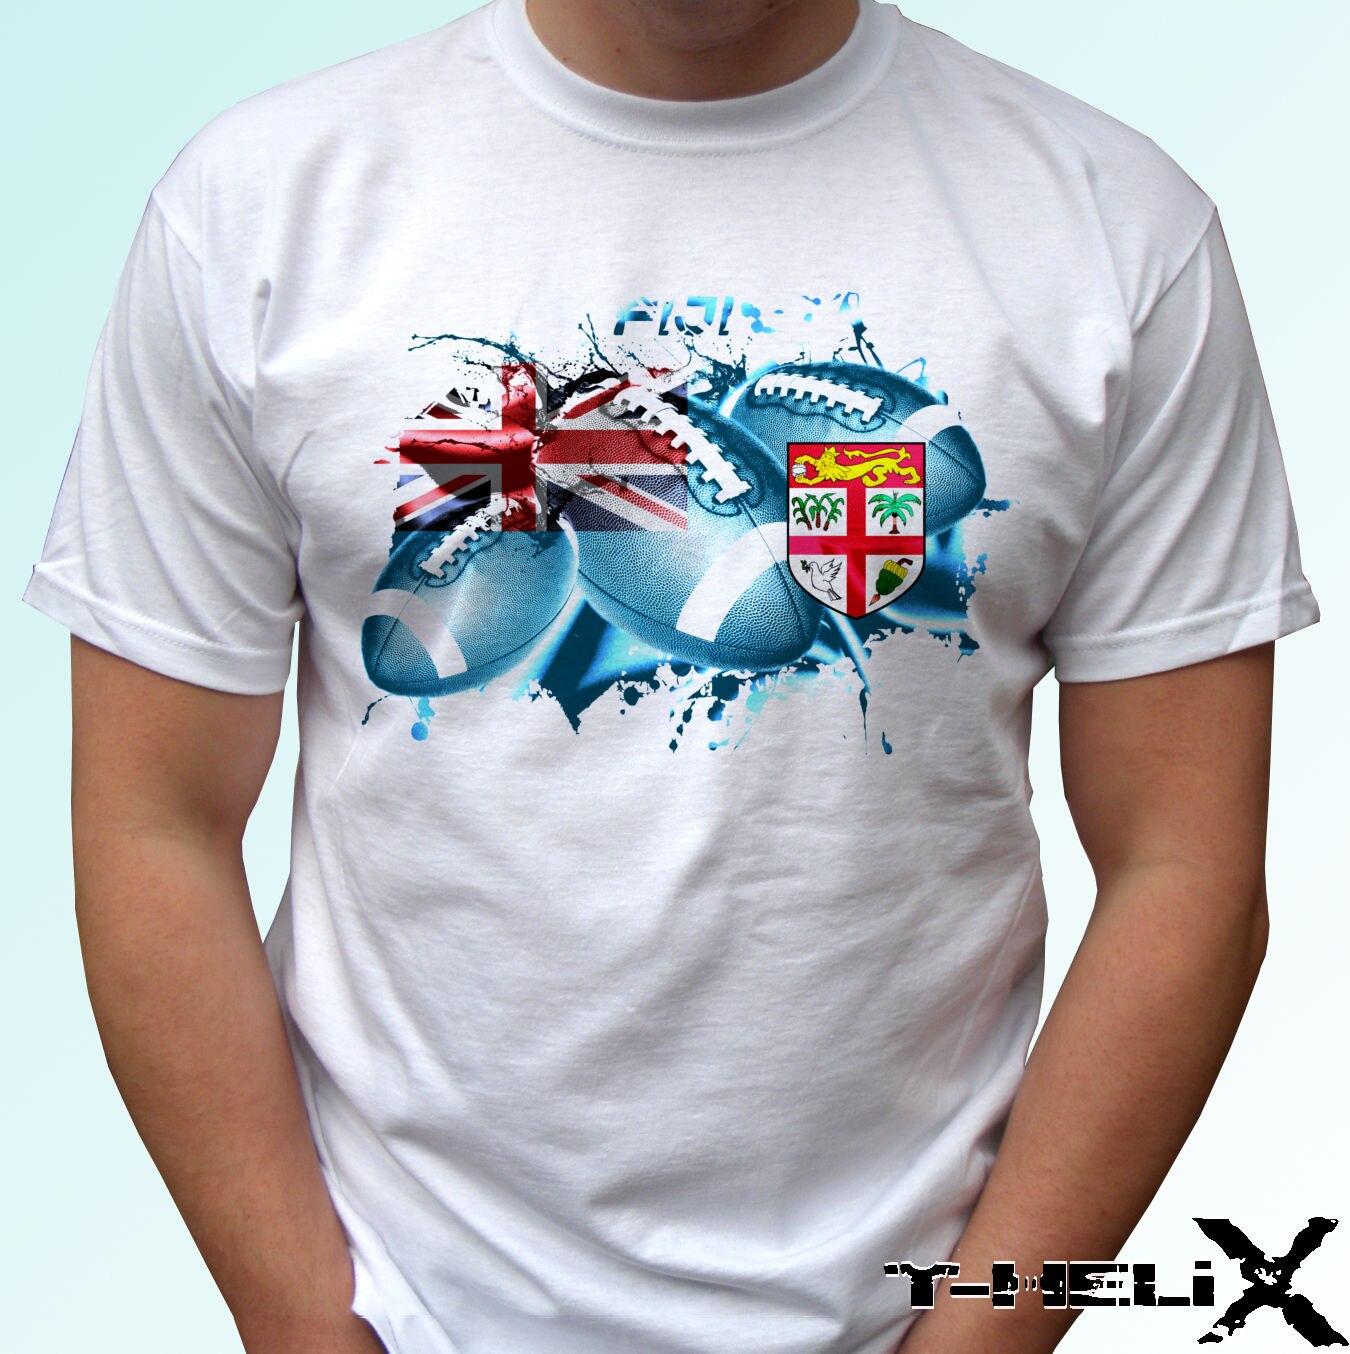 Fiji rugby ball éclaboussures Kids T-shirt Tee Top Cadeau Coupe Du Monde Sport